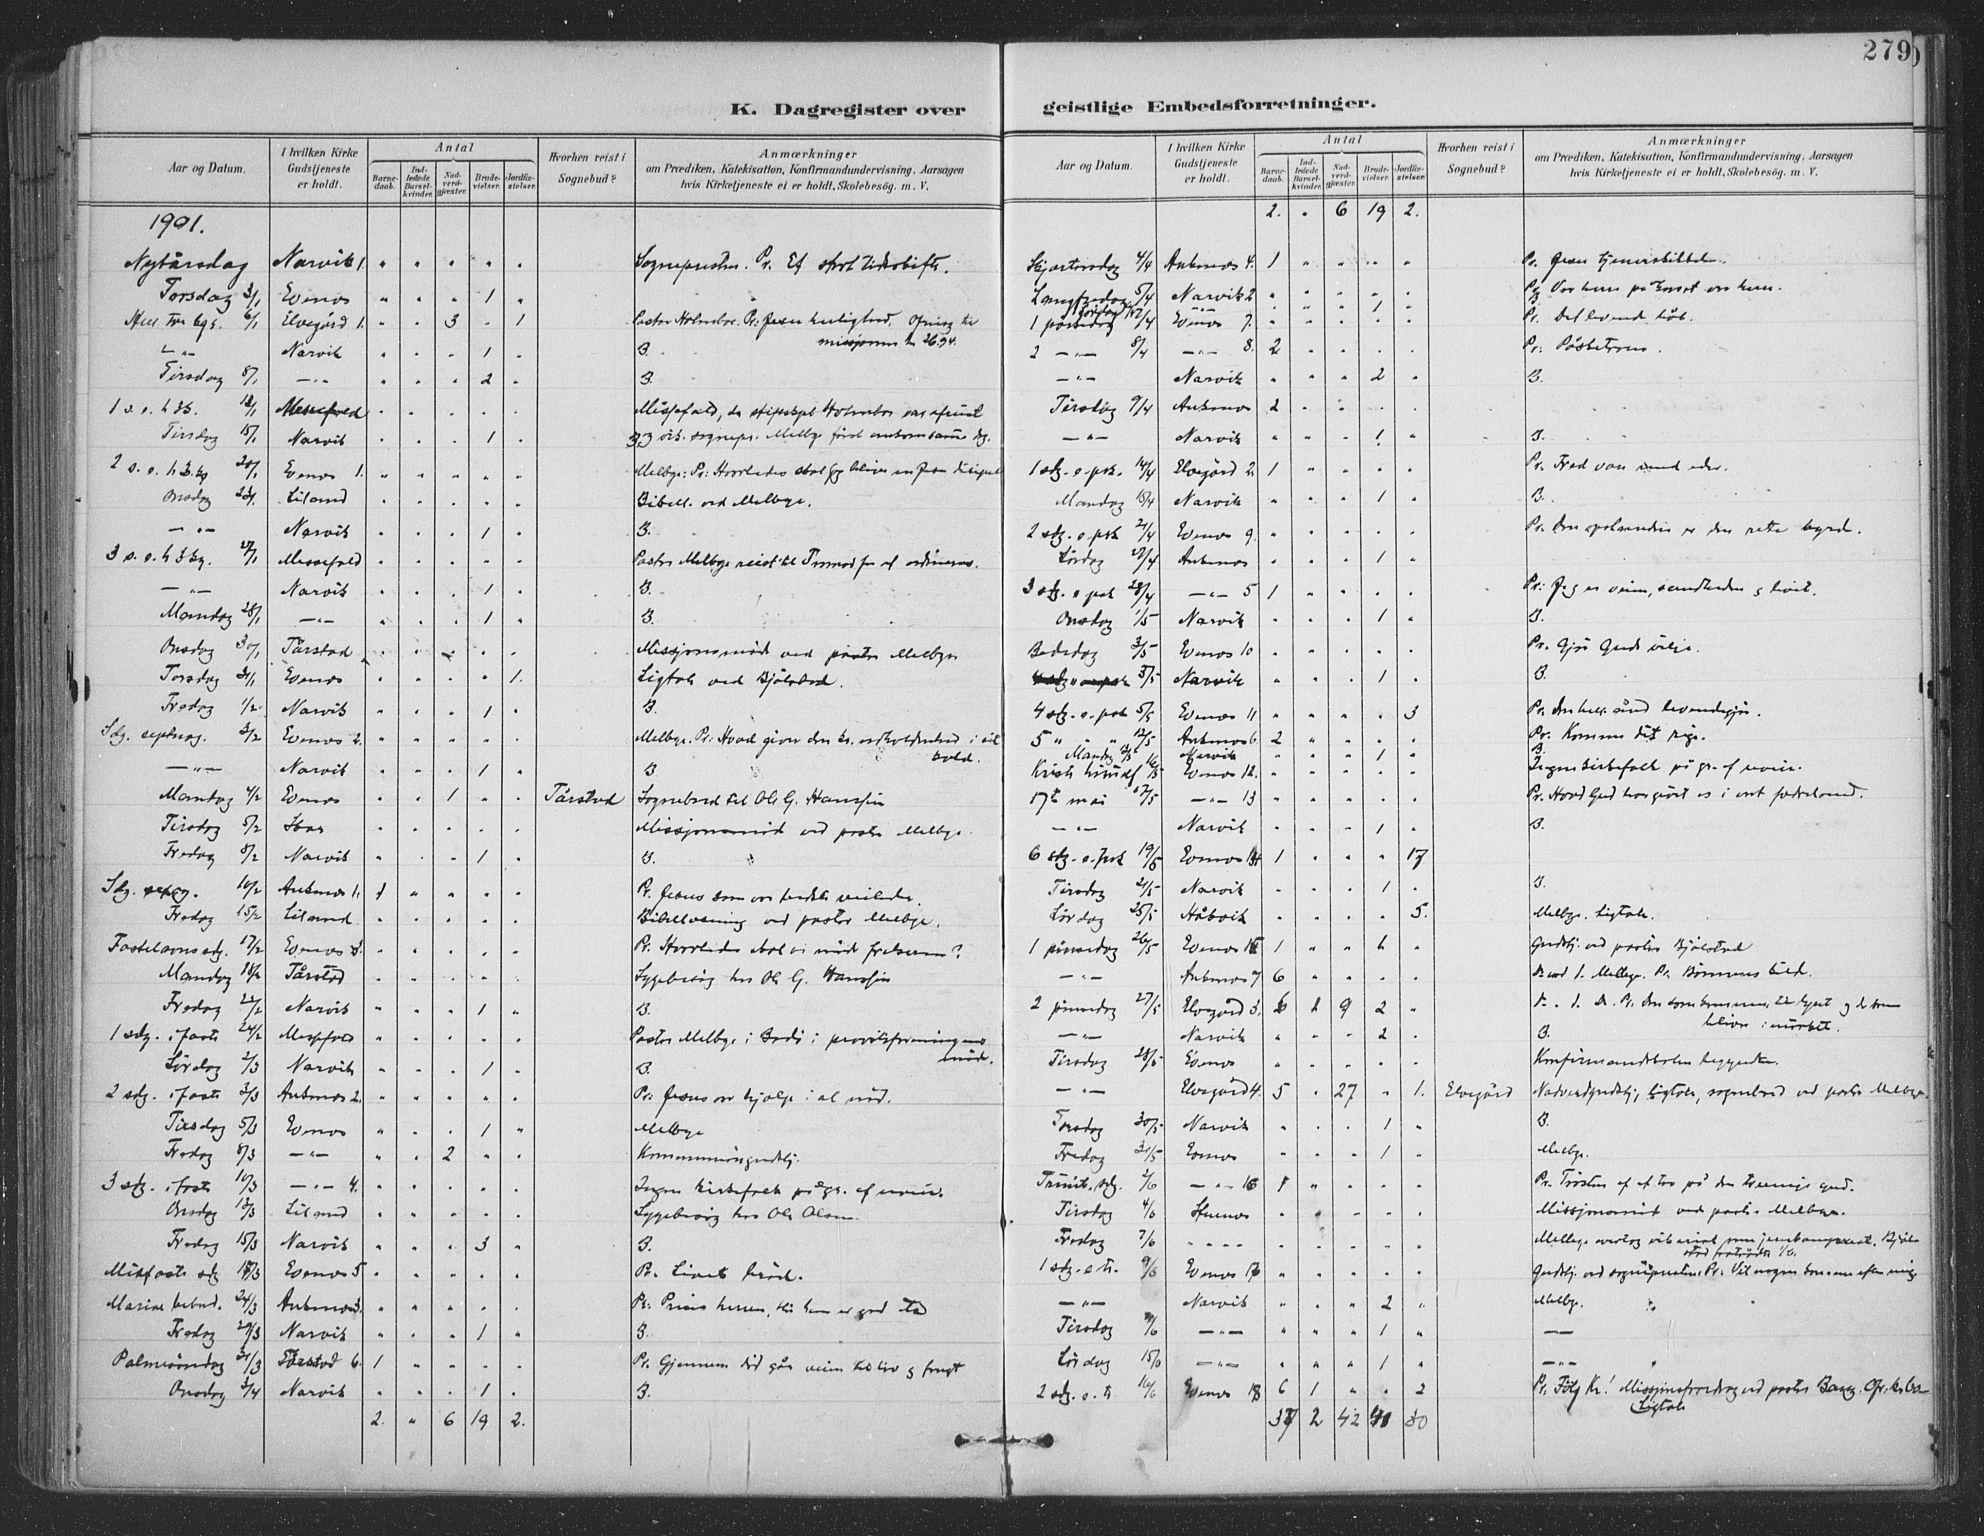 SAT, Ministerialprotokoller, klokkerbøker og fødselsregistre - Nordland, 863/L0899: Ministerialbok nr. 863A11, 1897-1906, s. 279